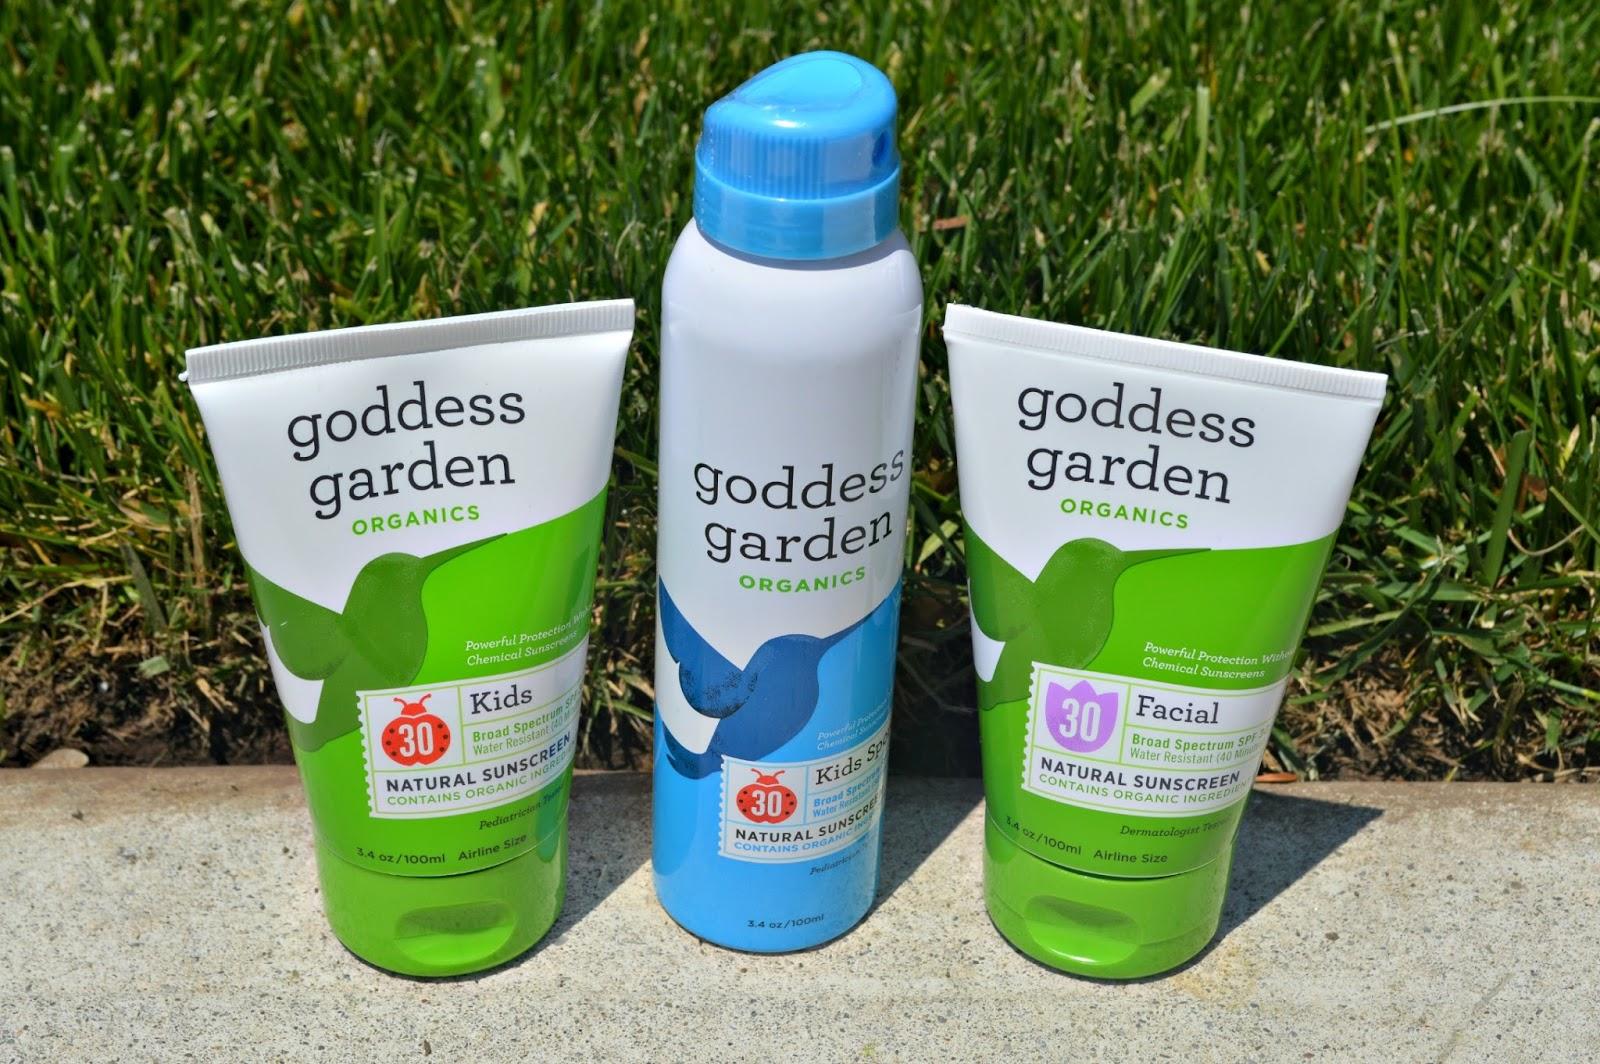 beauty everyday organics goddess dp garden amazon lotion ounce sunscreen natural spf ca